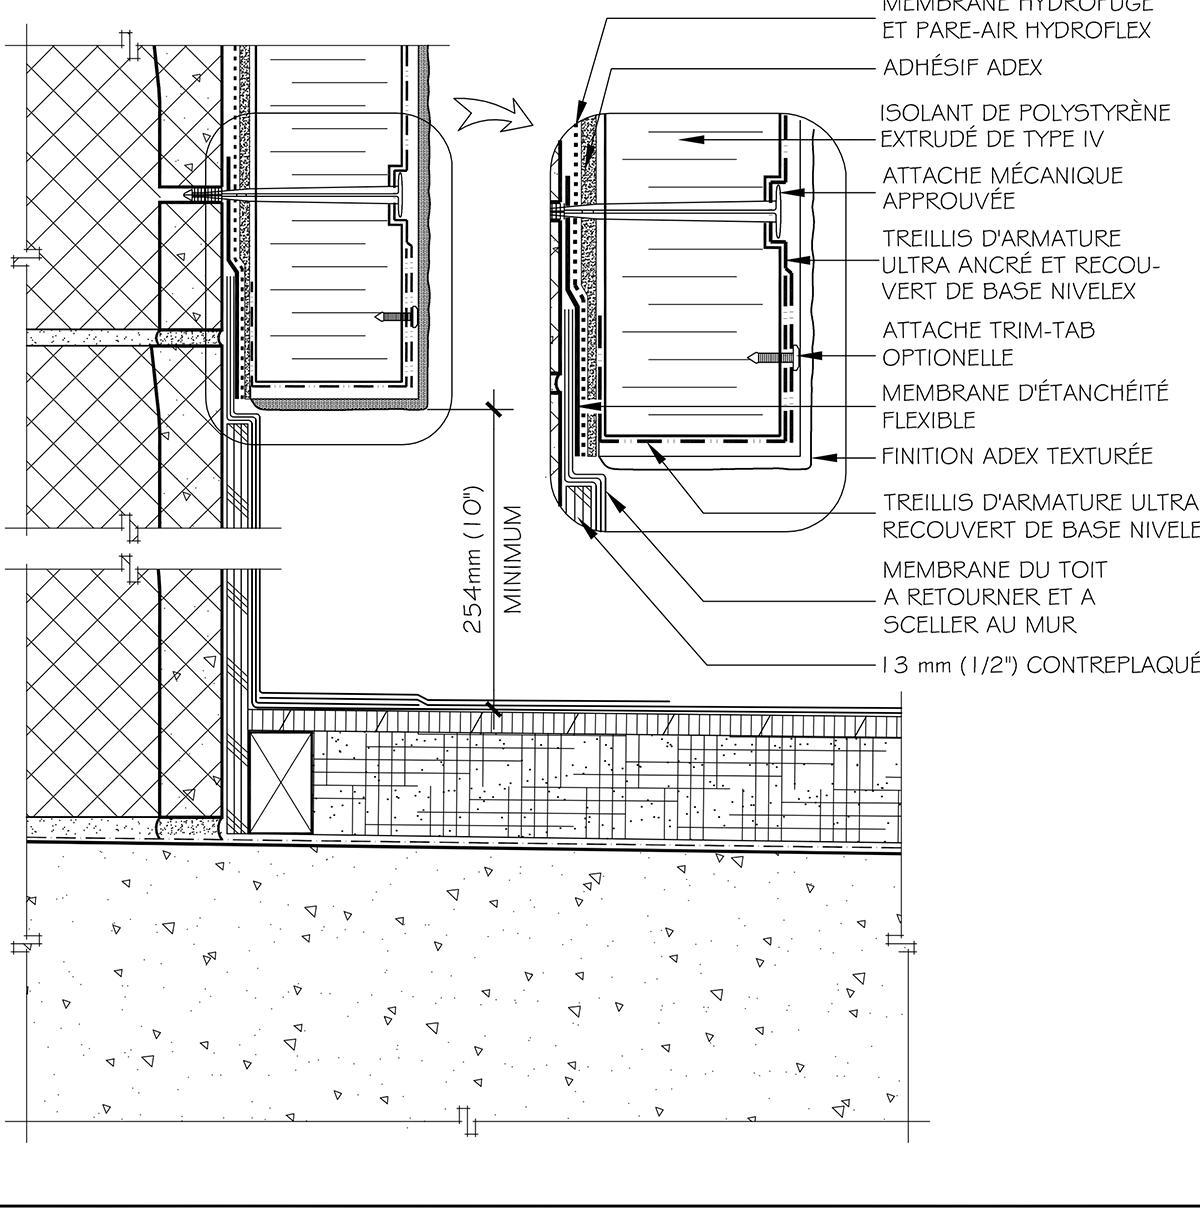 Different Type De Mur adex-ici-hc-fr-9a-jonction-toit-mur - adex